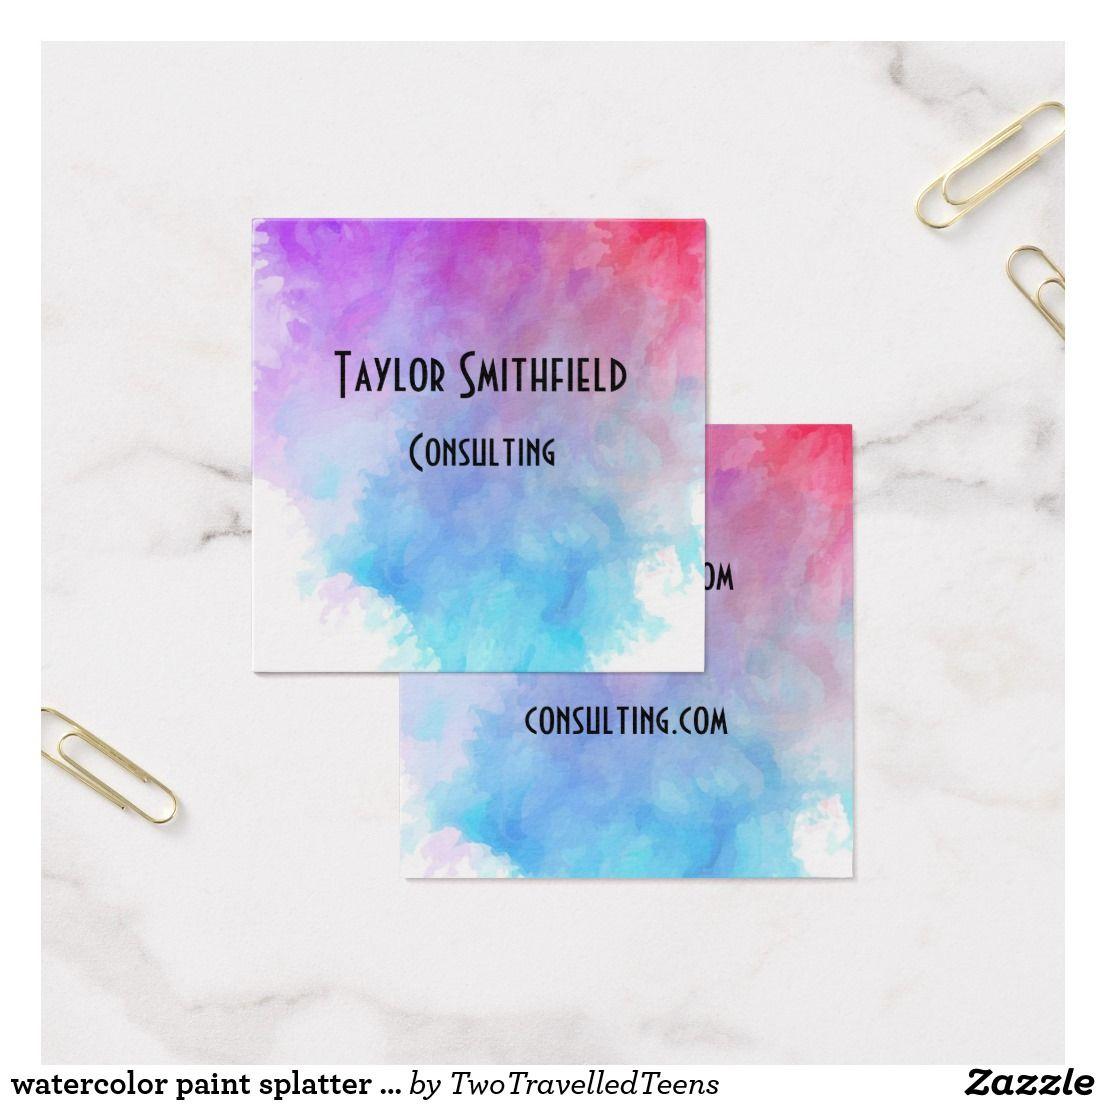 watercolor paint splatter splash business card | Business